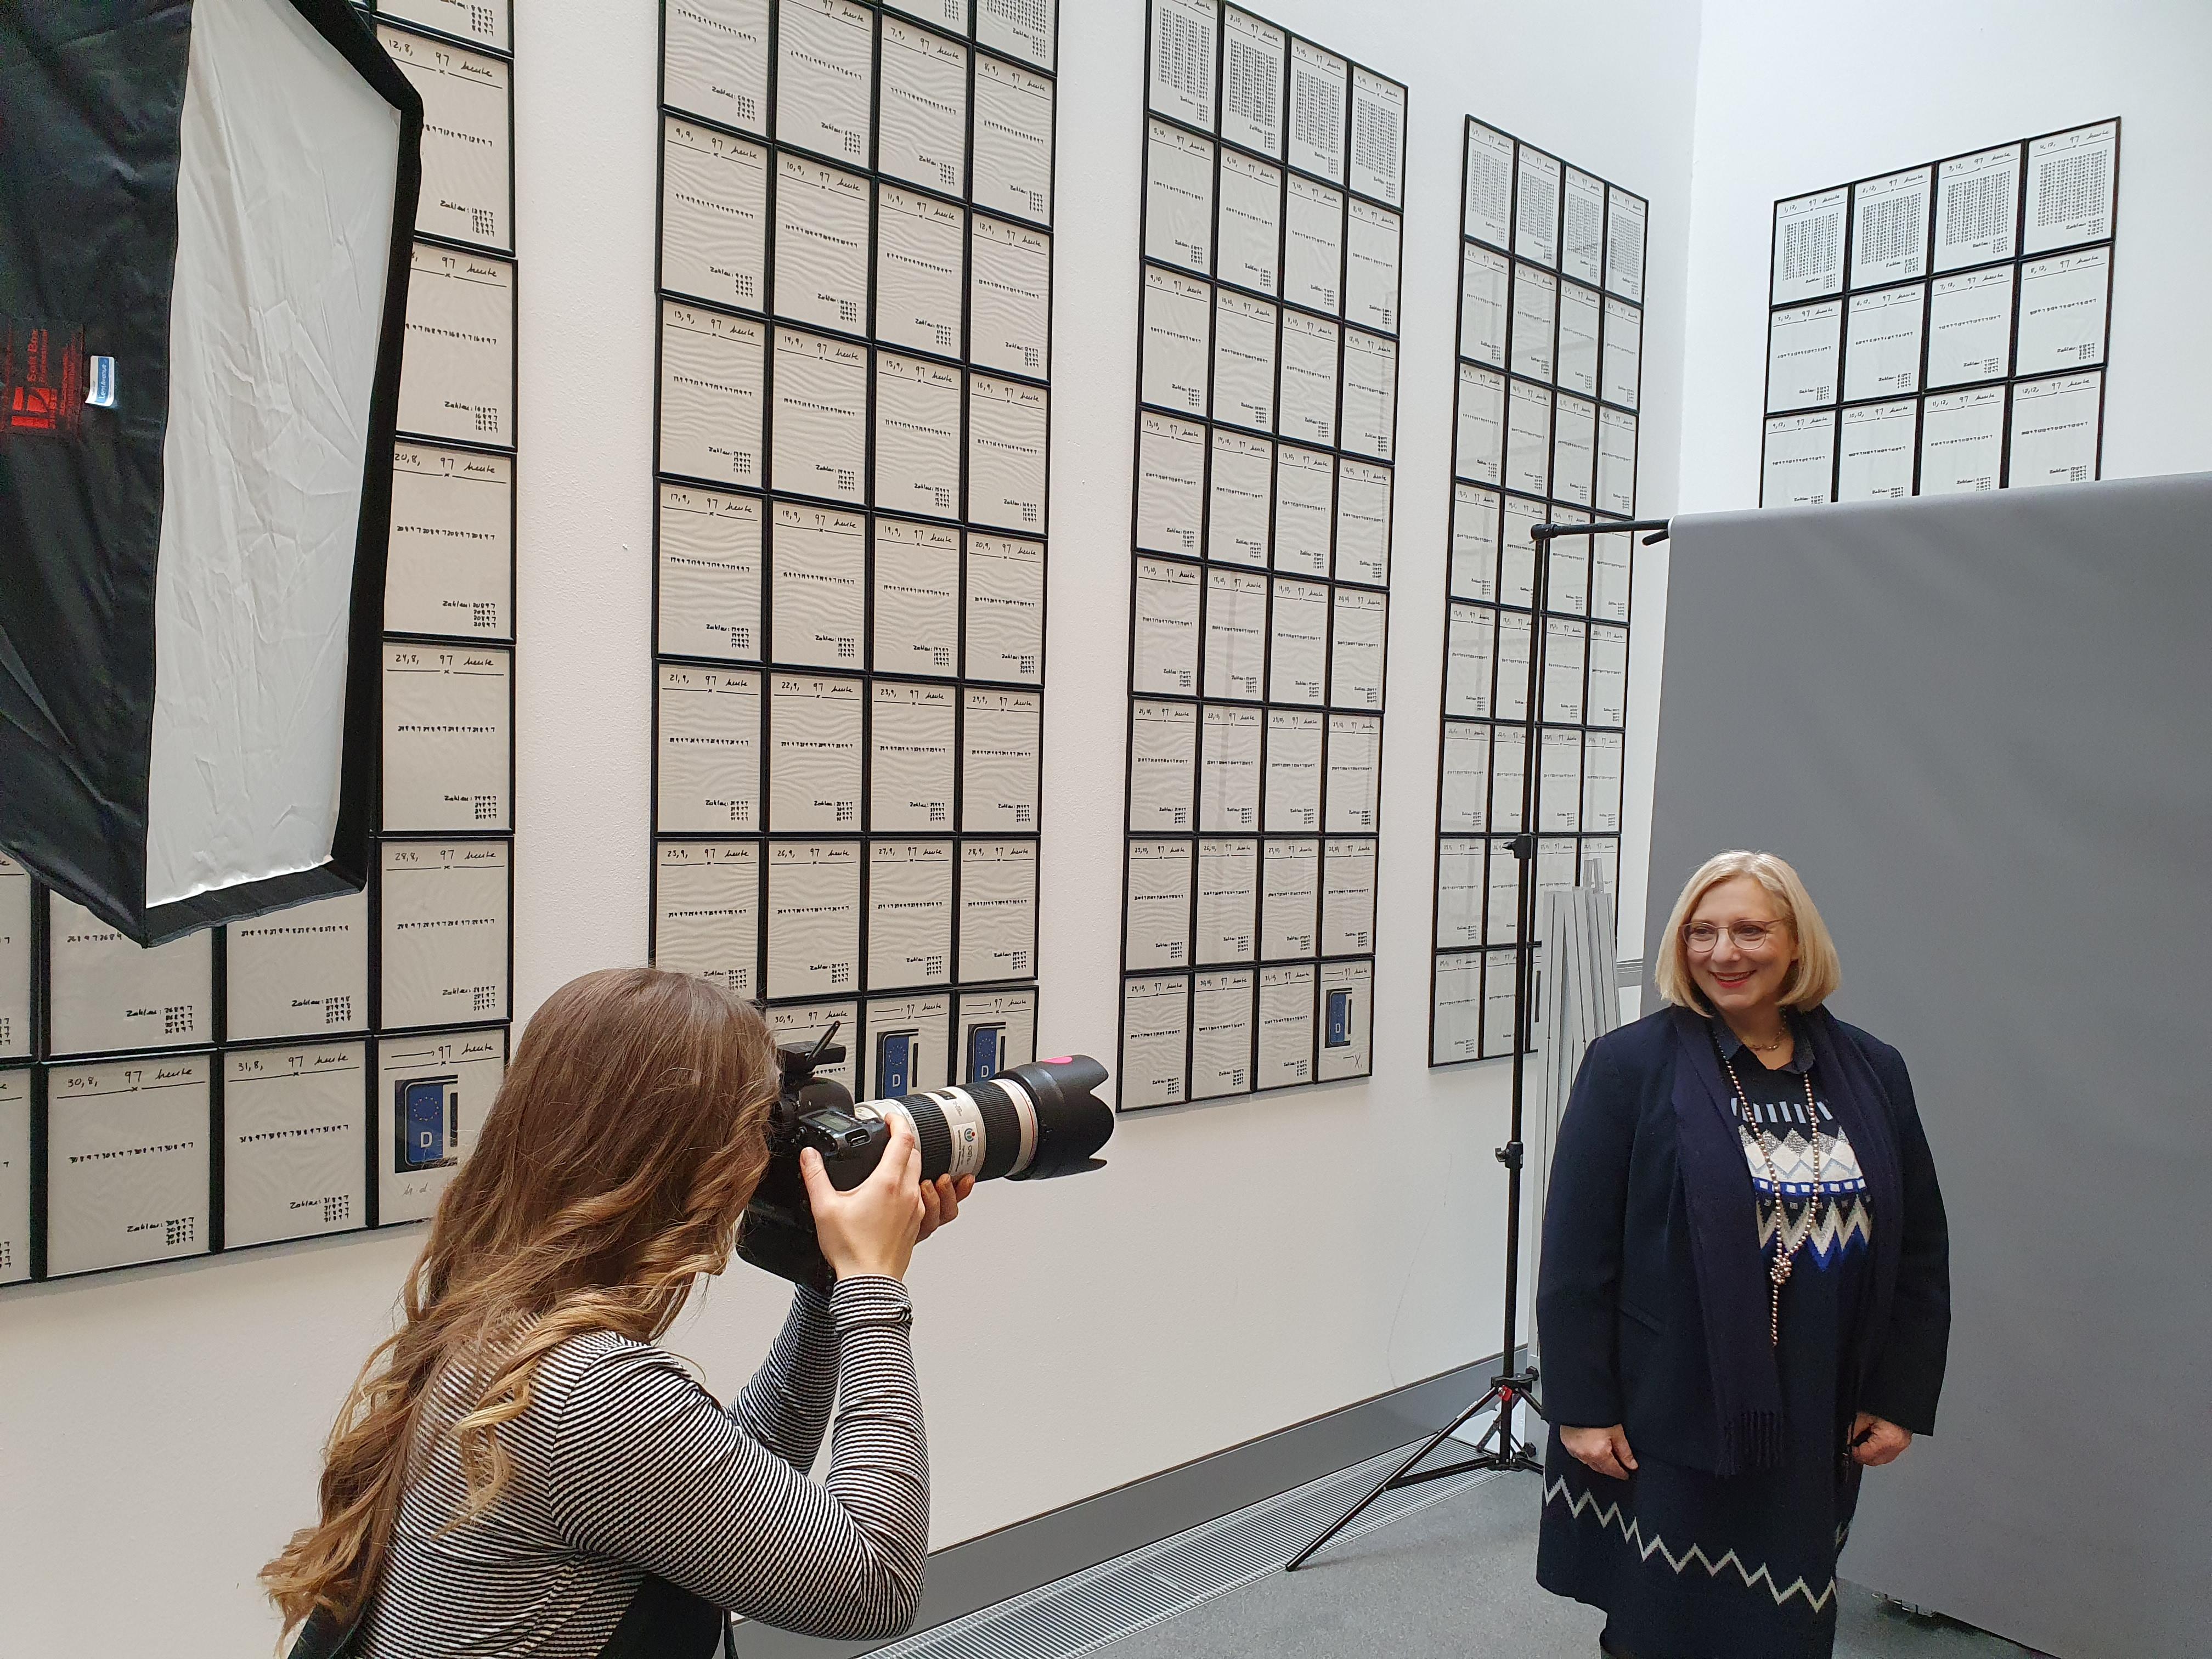 Dr. Daniela De Ridder beim Wikipedia-Photoshooting II